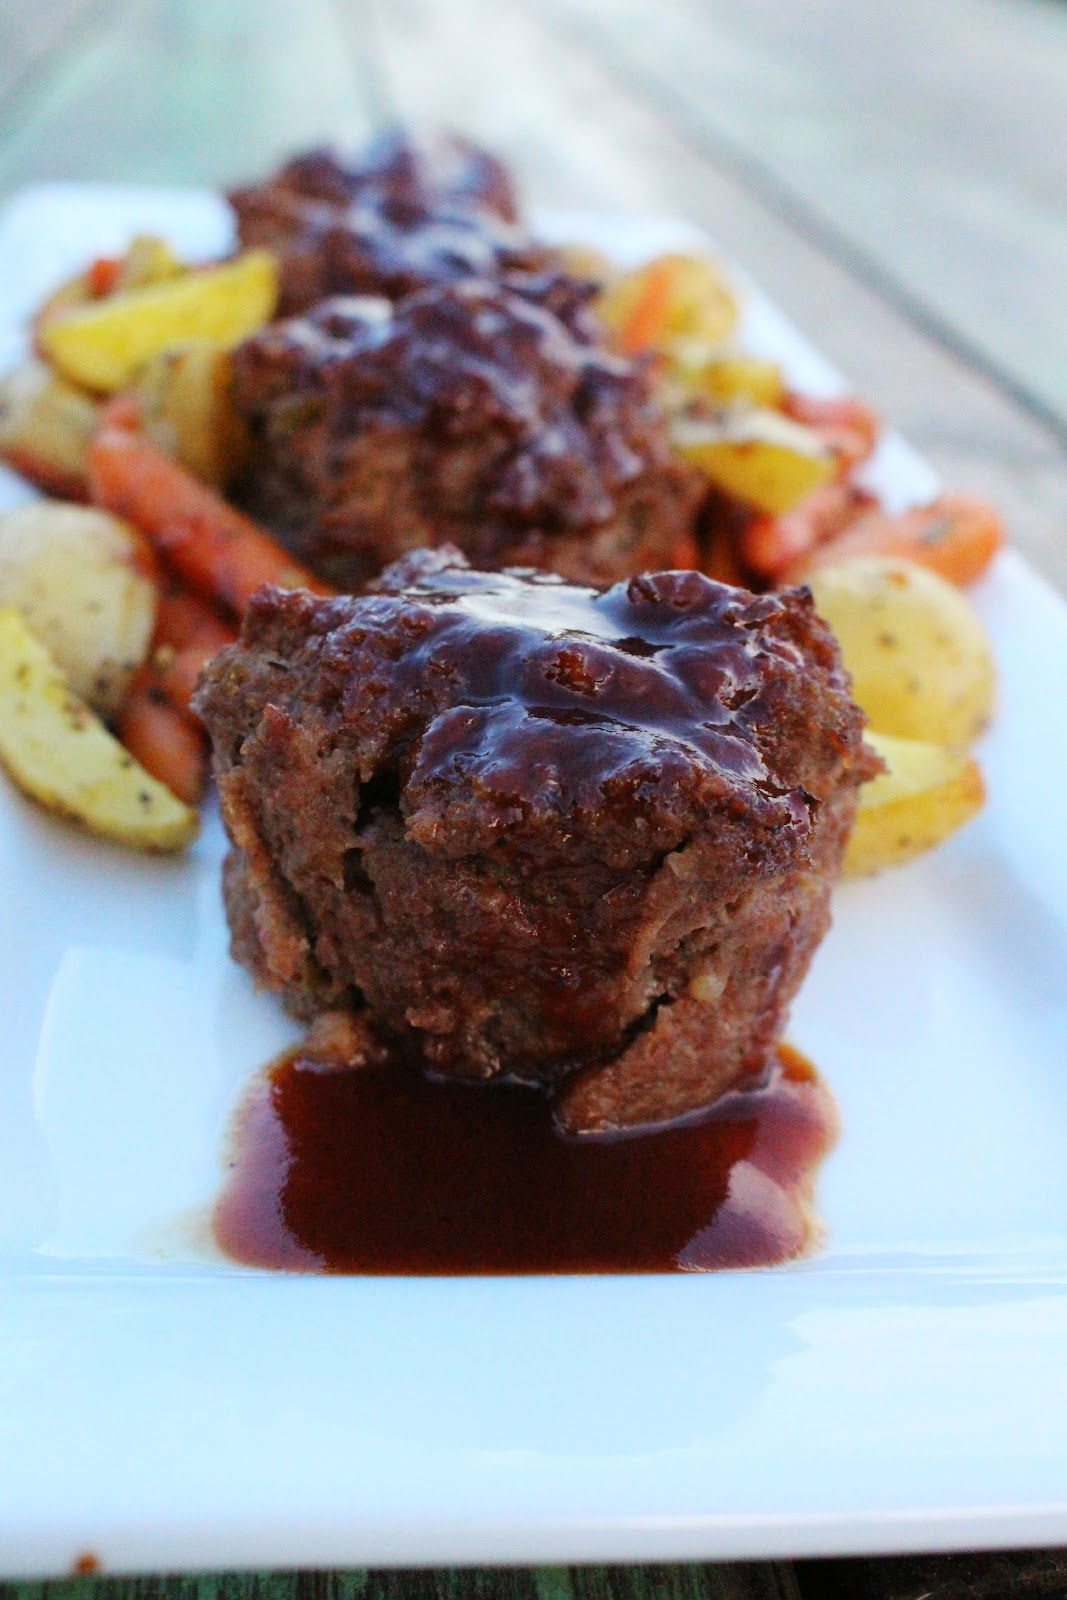 Pb J Babes We Eat Bbq Meatloaf Muffins Roasted Veggies